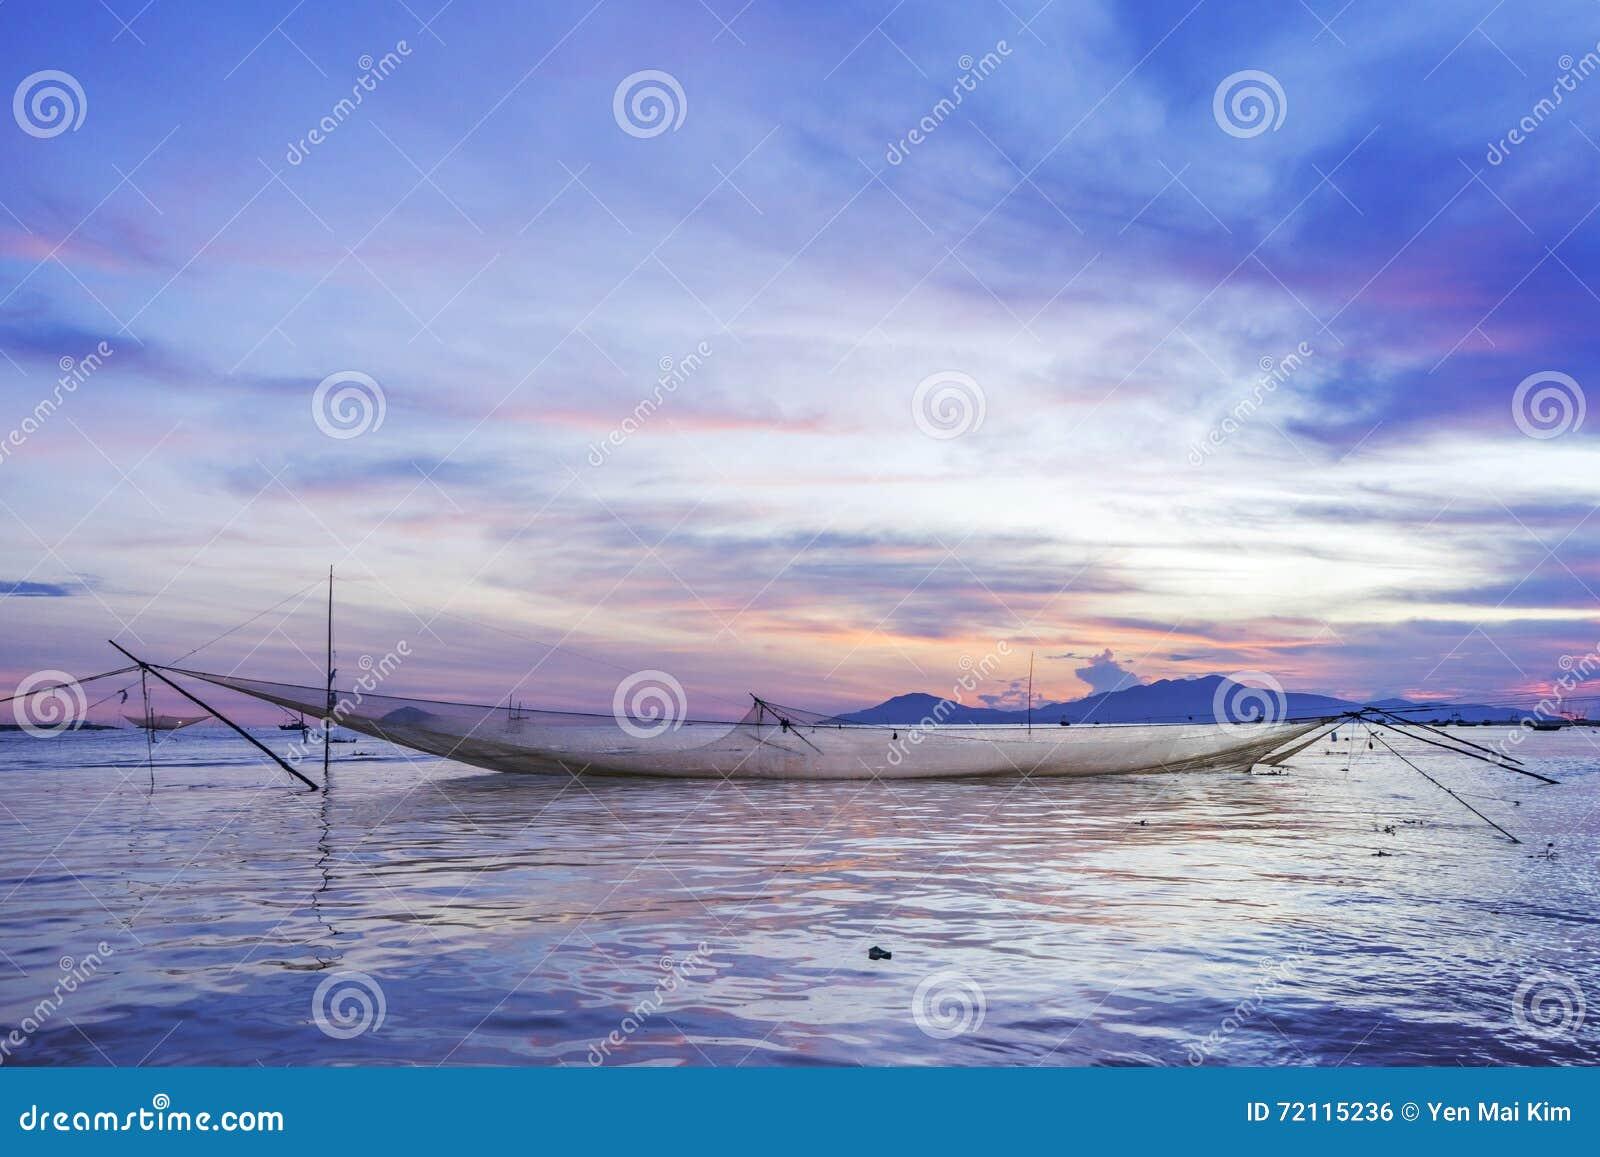 Cua Dai plaża, Hoi miasto, Quang Nam prowincja, Wietnam